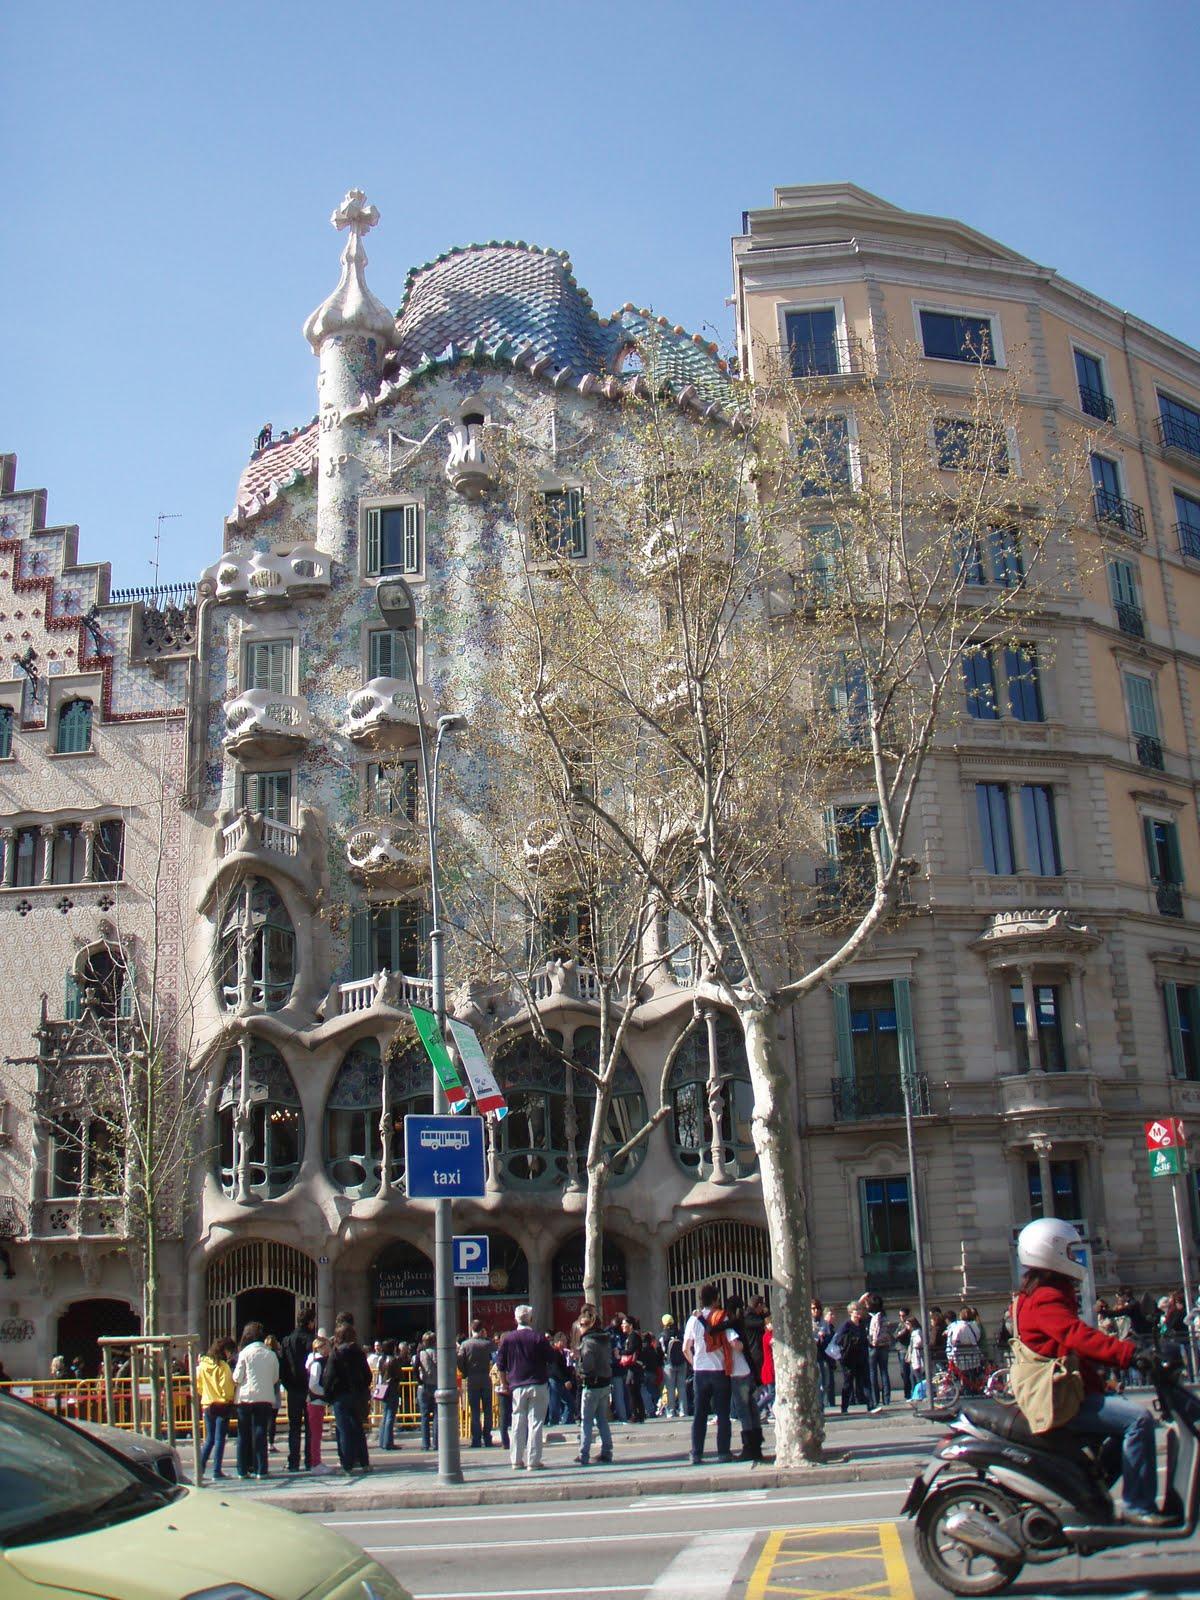 Italian Food Near Me Abandone Building Casa: An Art Work A Day: Gaudi And Park Guell